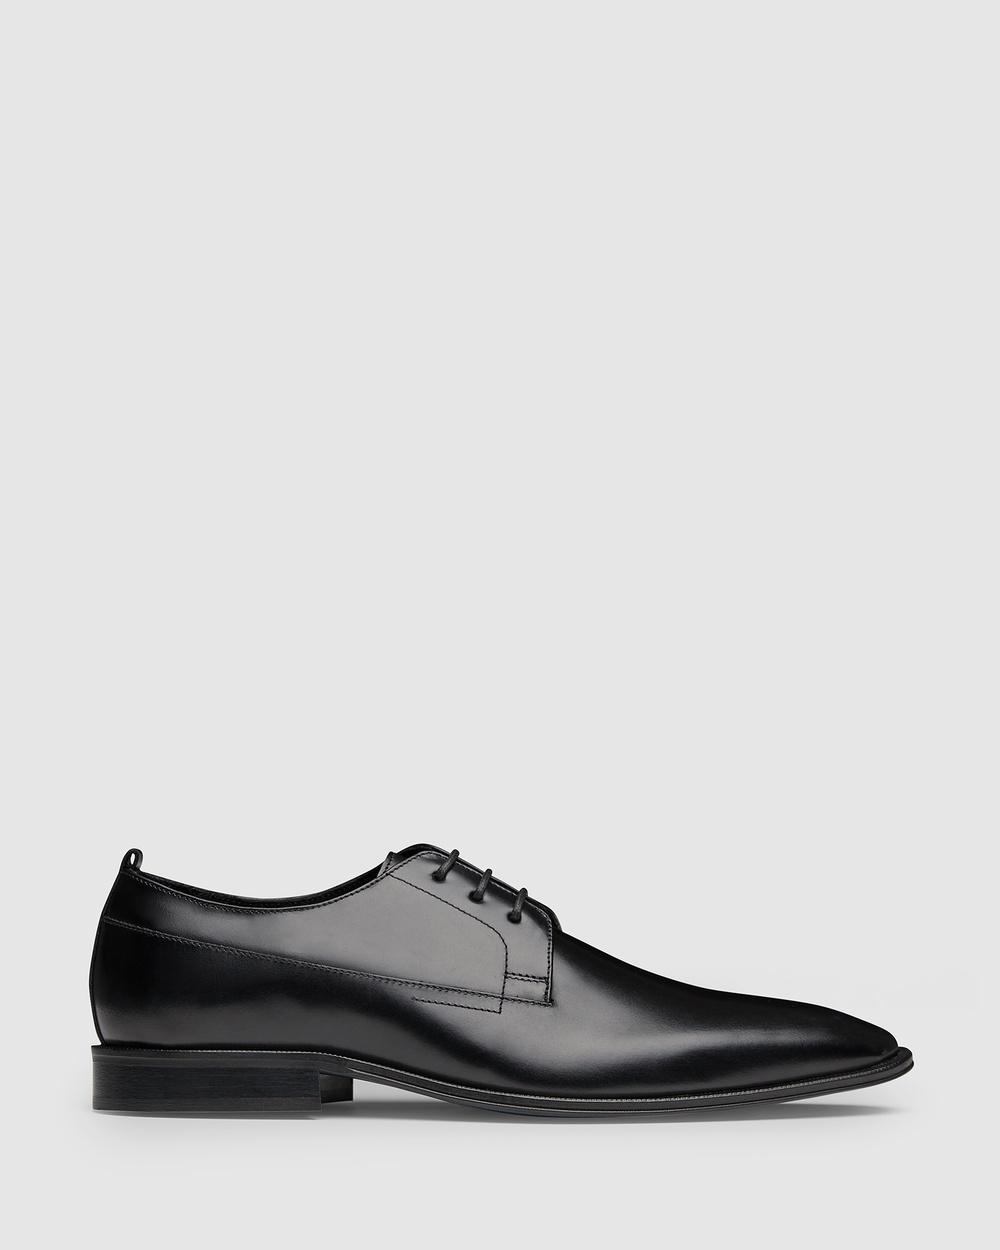 Aquila Barclays Dress Shoes Black